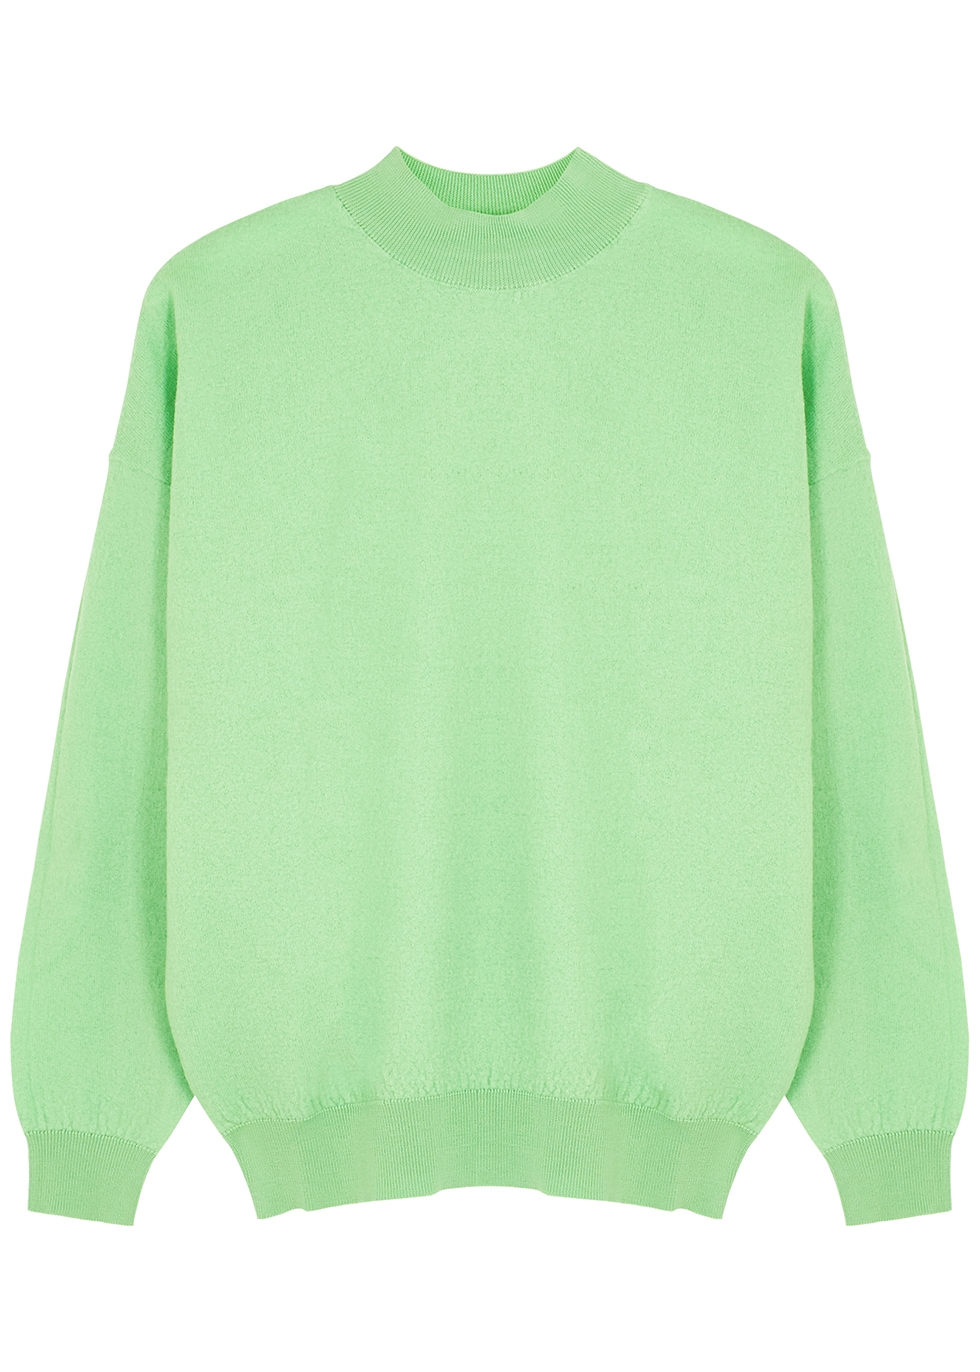 Tadbow green merino wool jumper